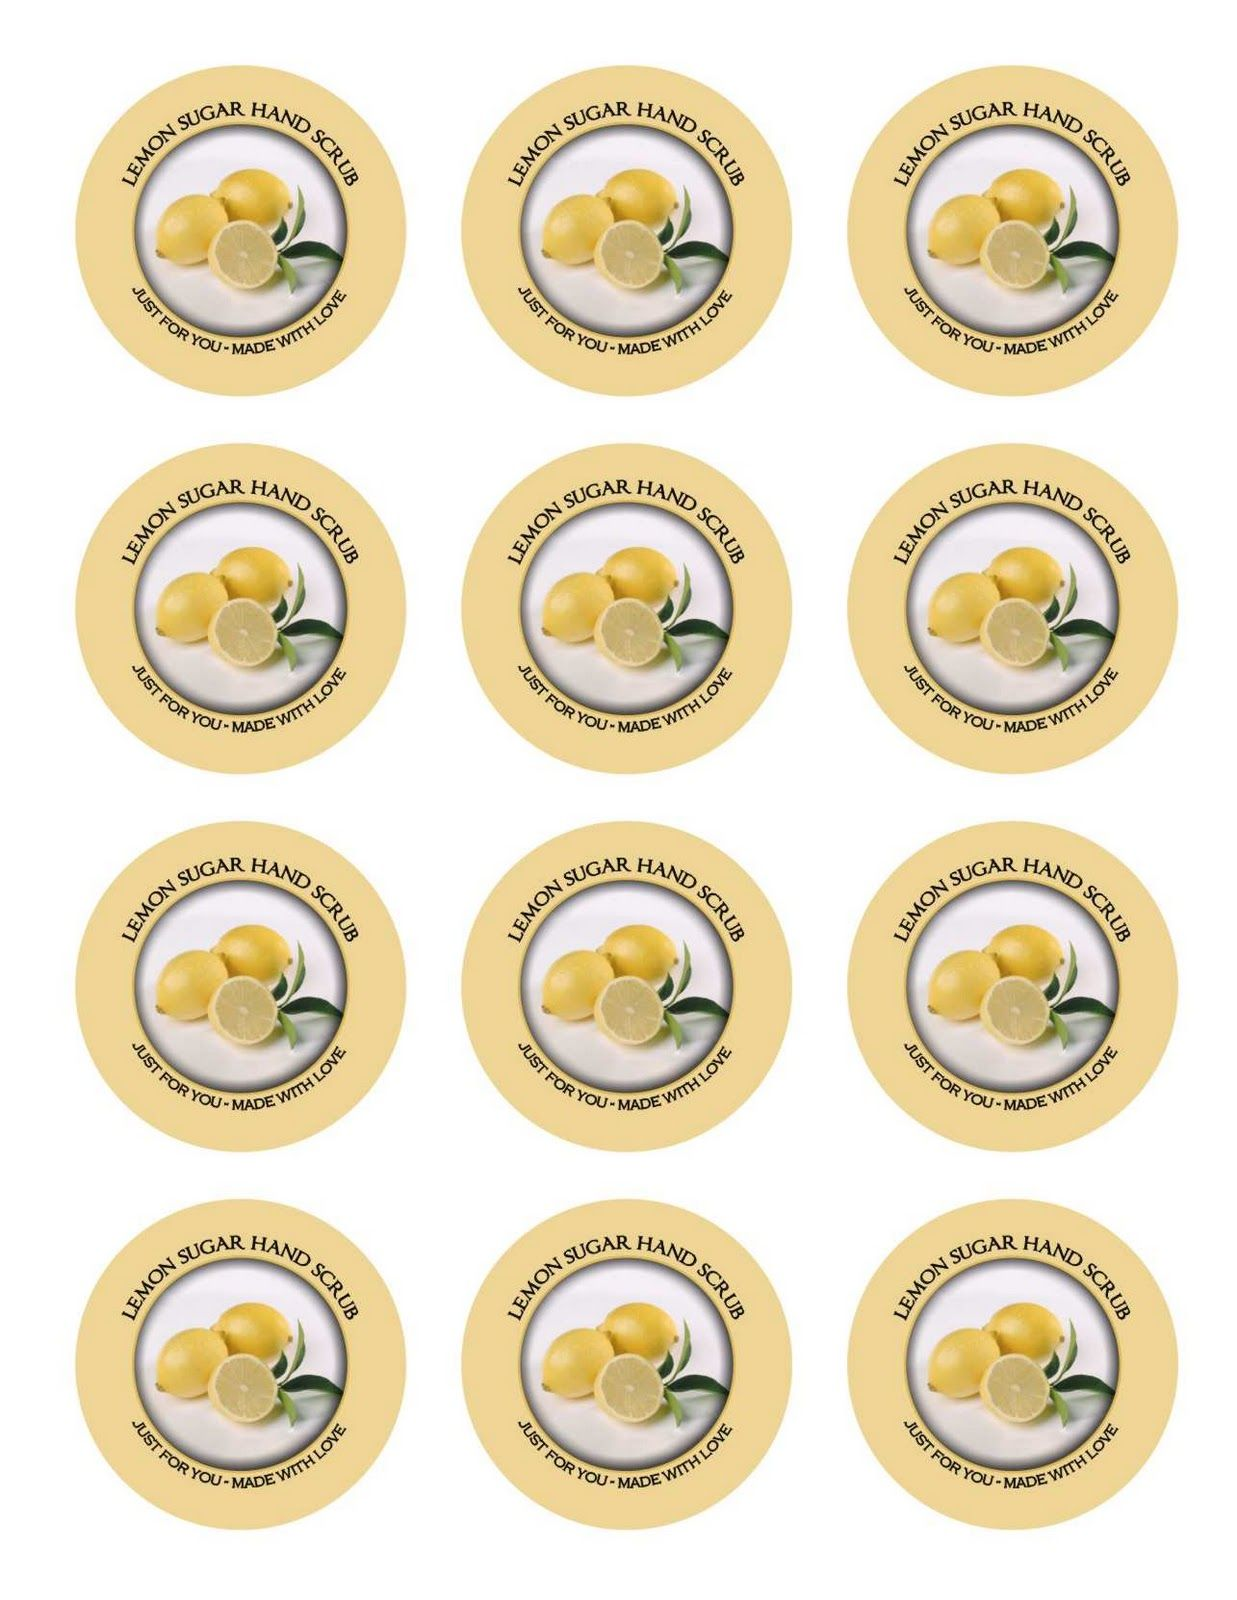 Lemon Sugar Hand Scrub Labels